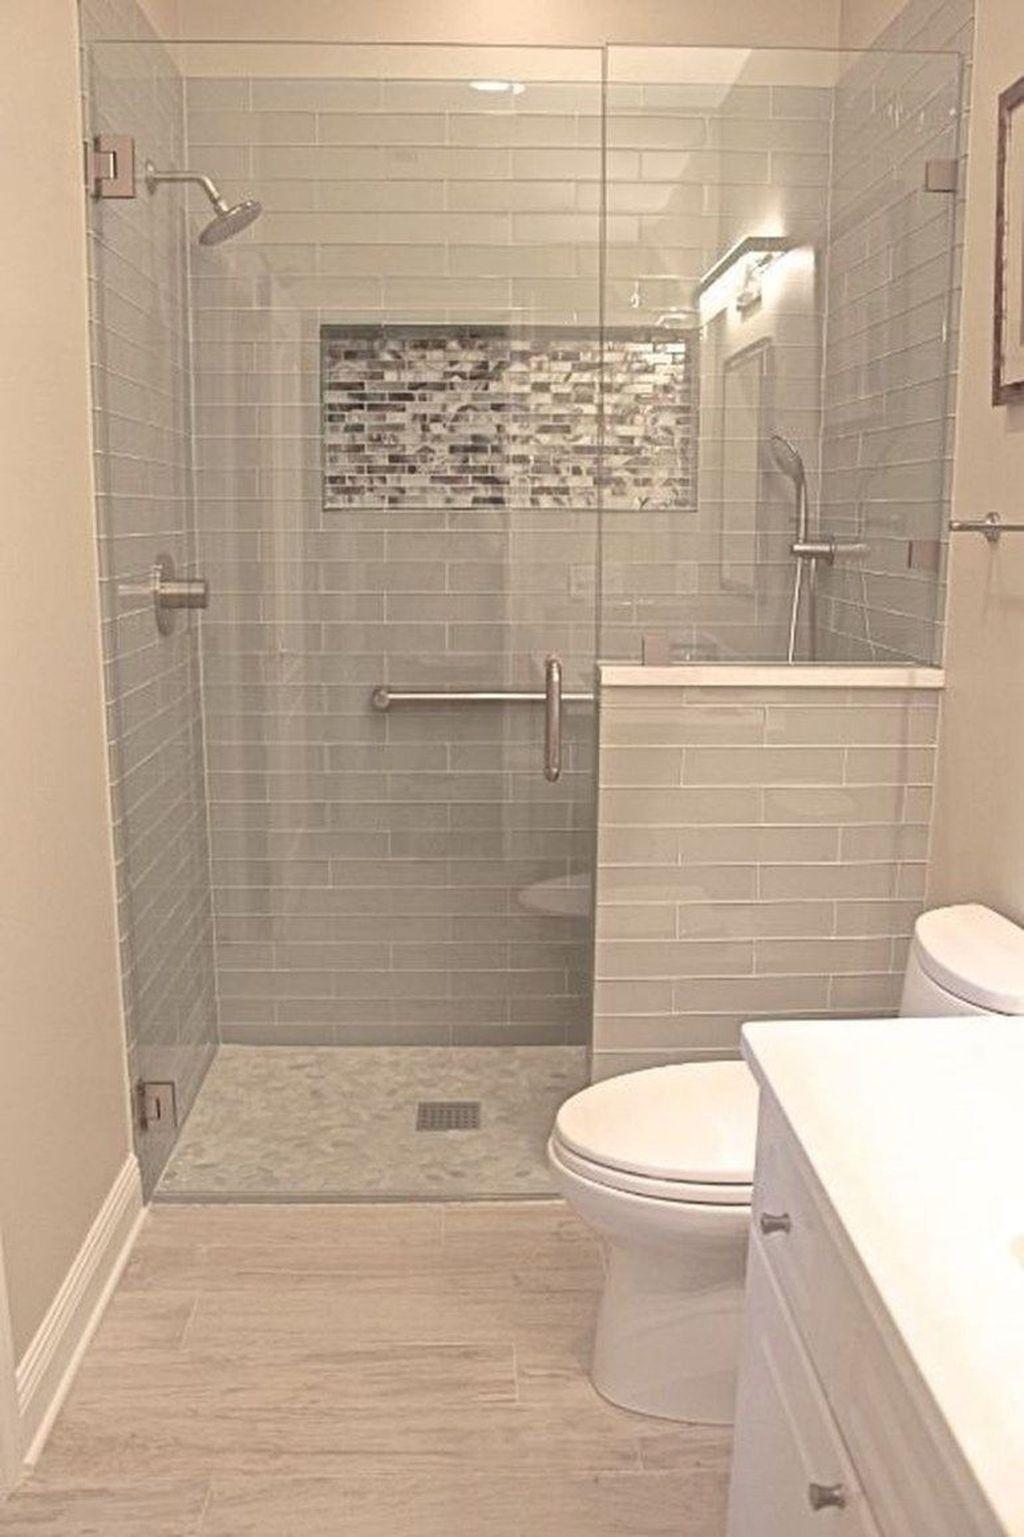 20 Comfy Bathroom Design Ideas For Home With Images Bathroom